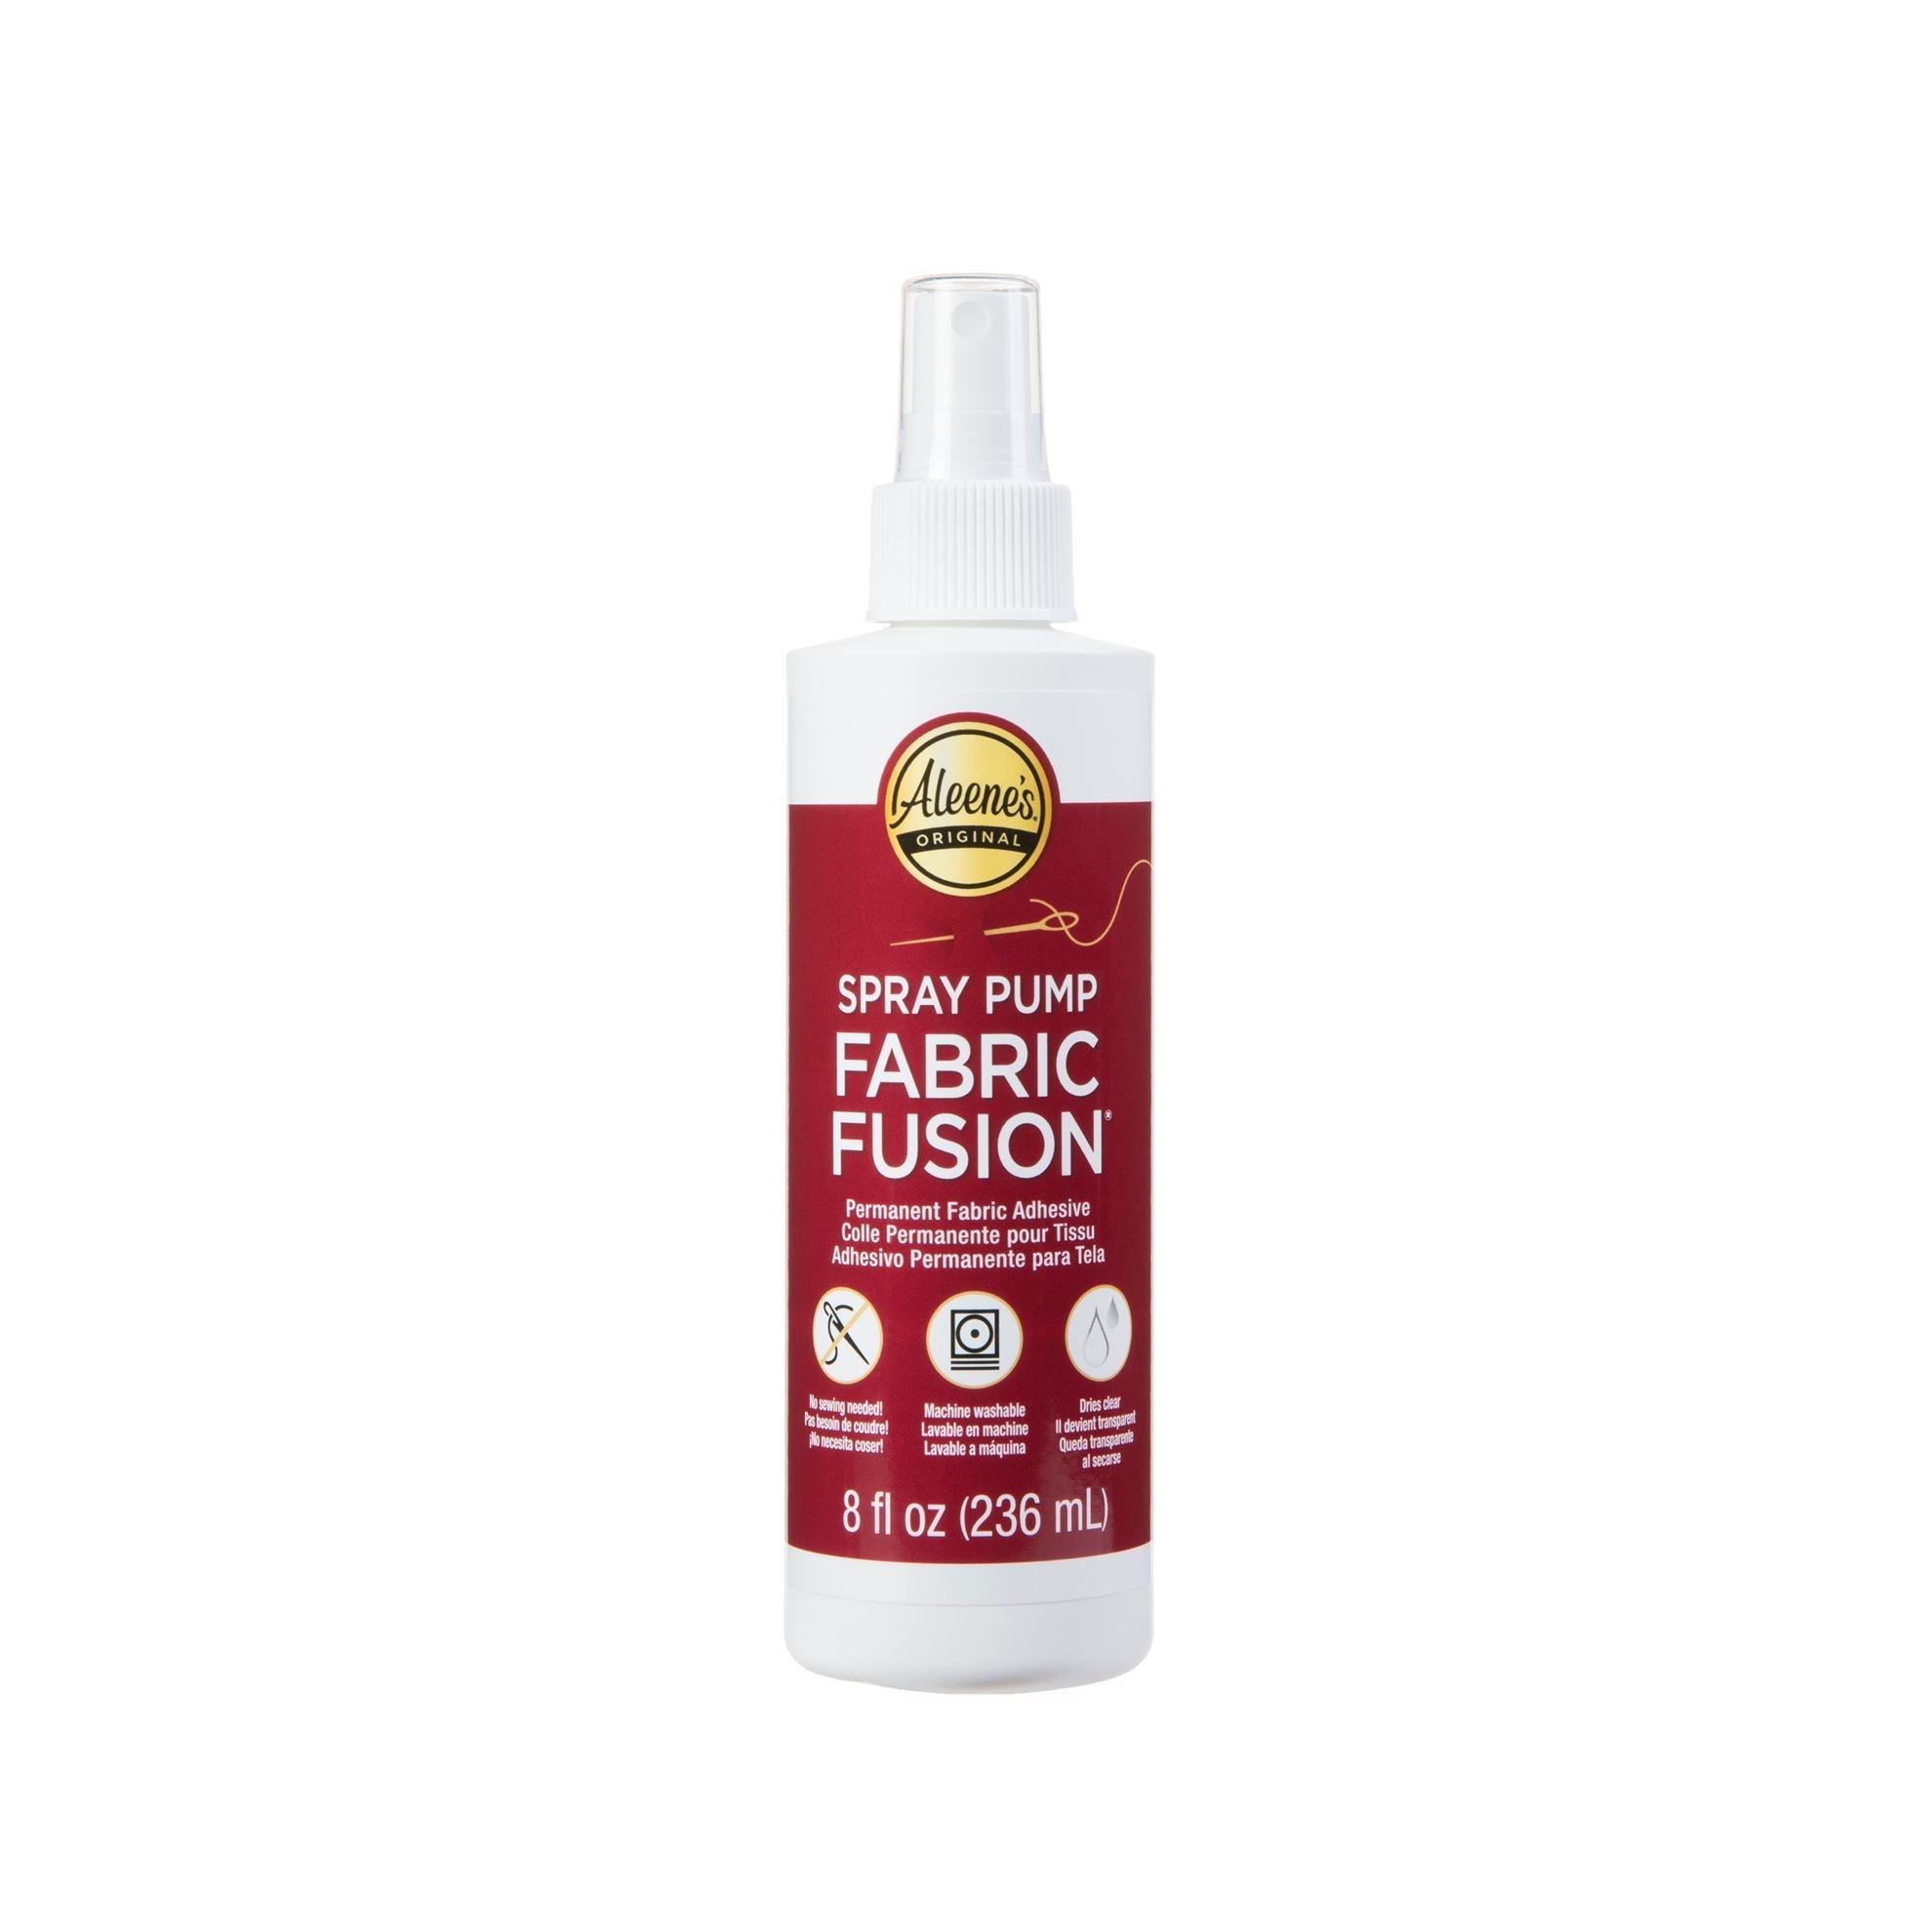 Fabric Fusion Spray Pump